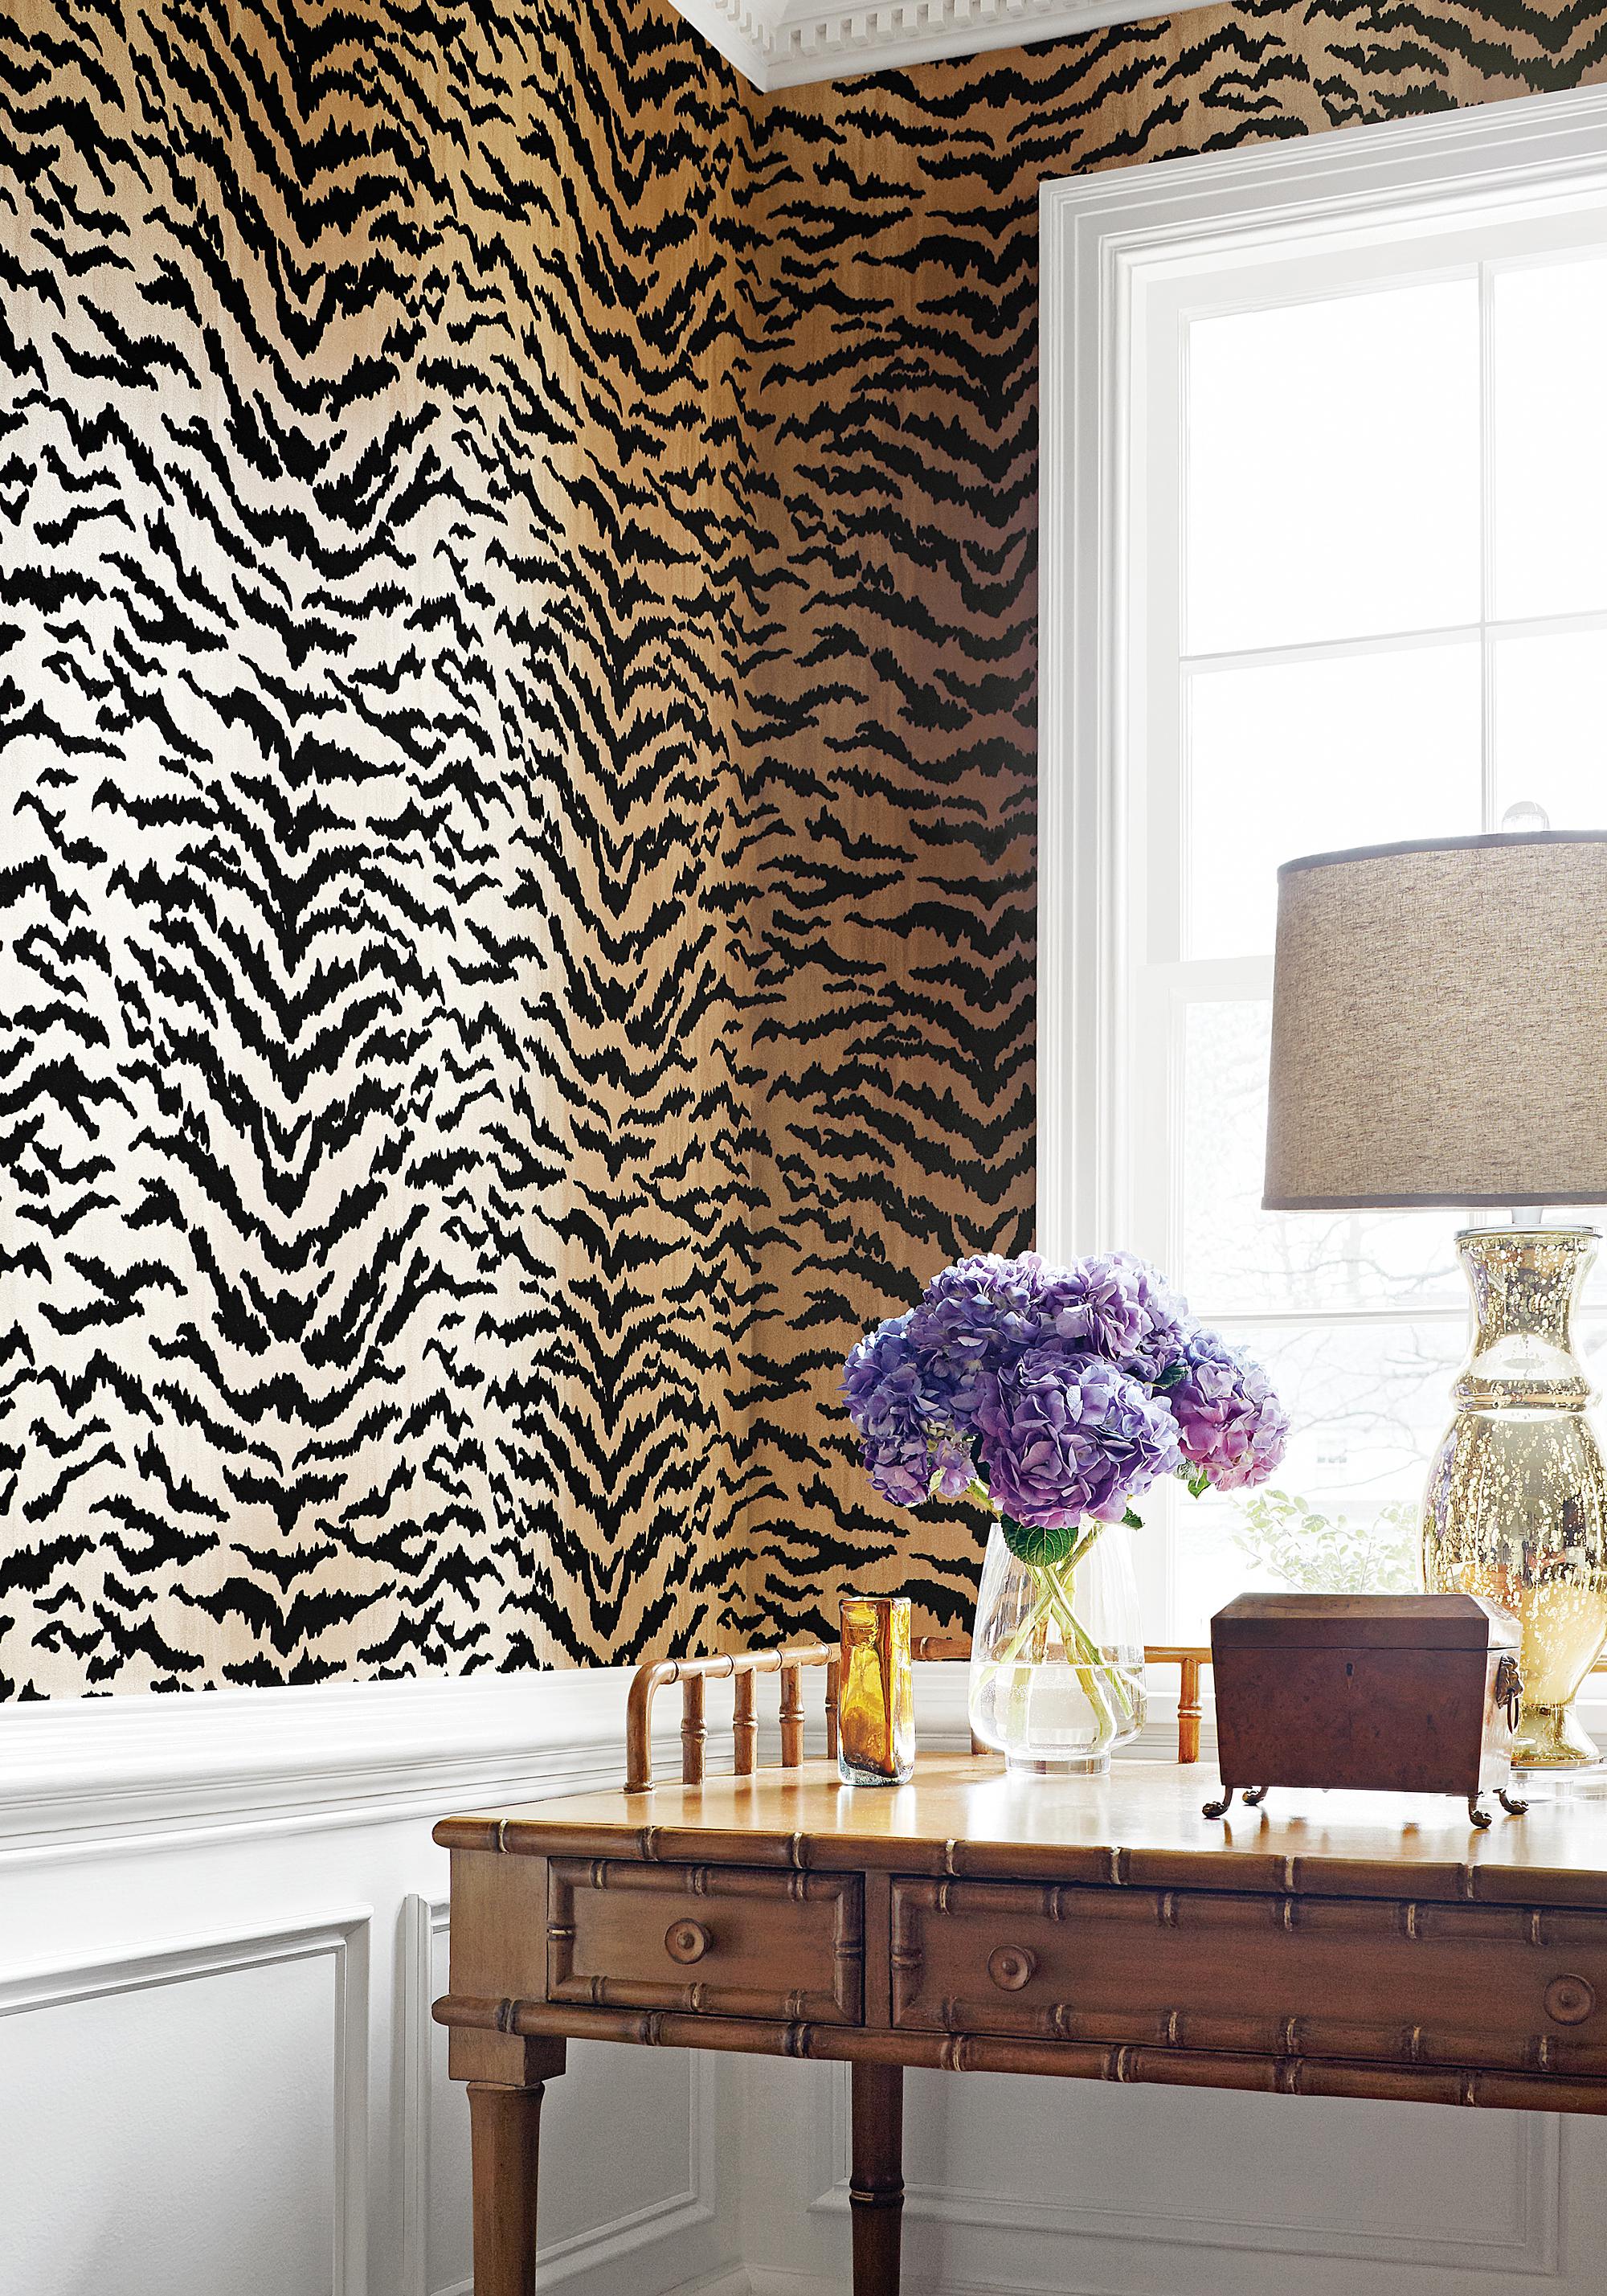 Amazing Animal Print Wallpaper Ideas – shoproomideas